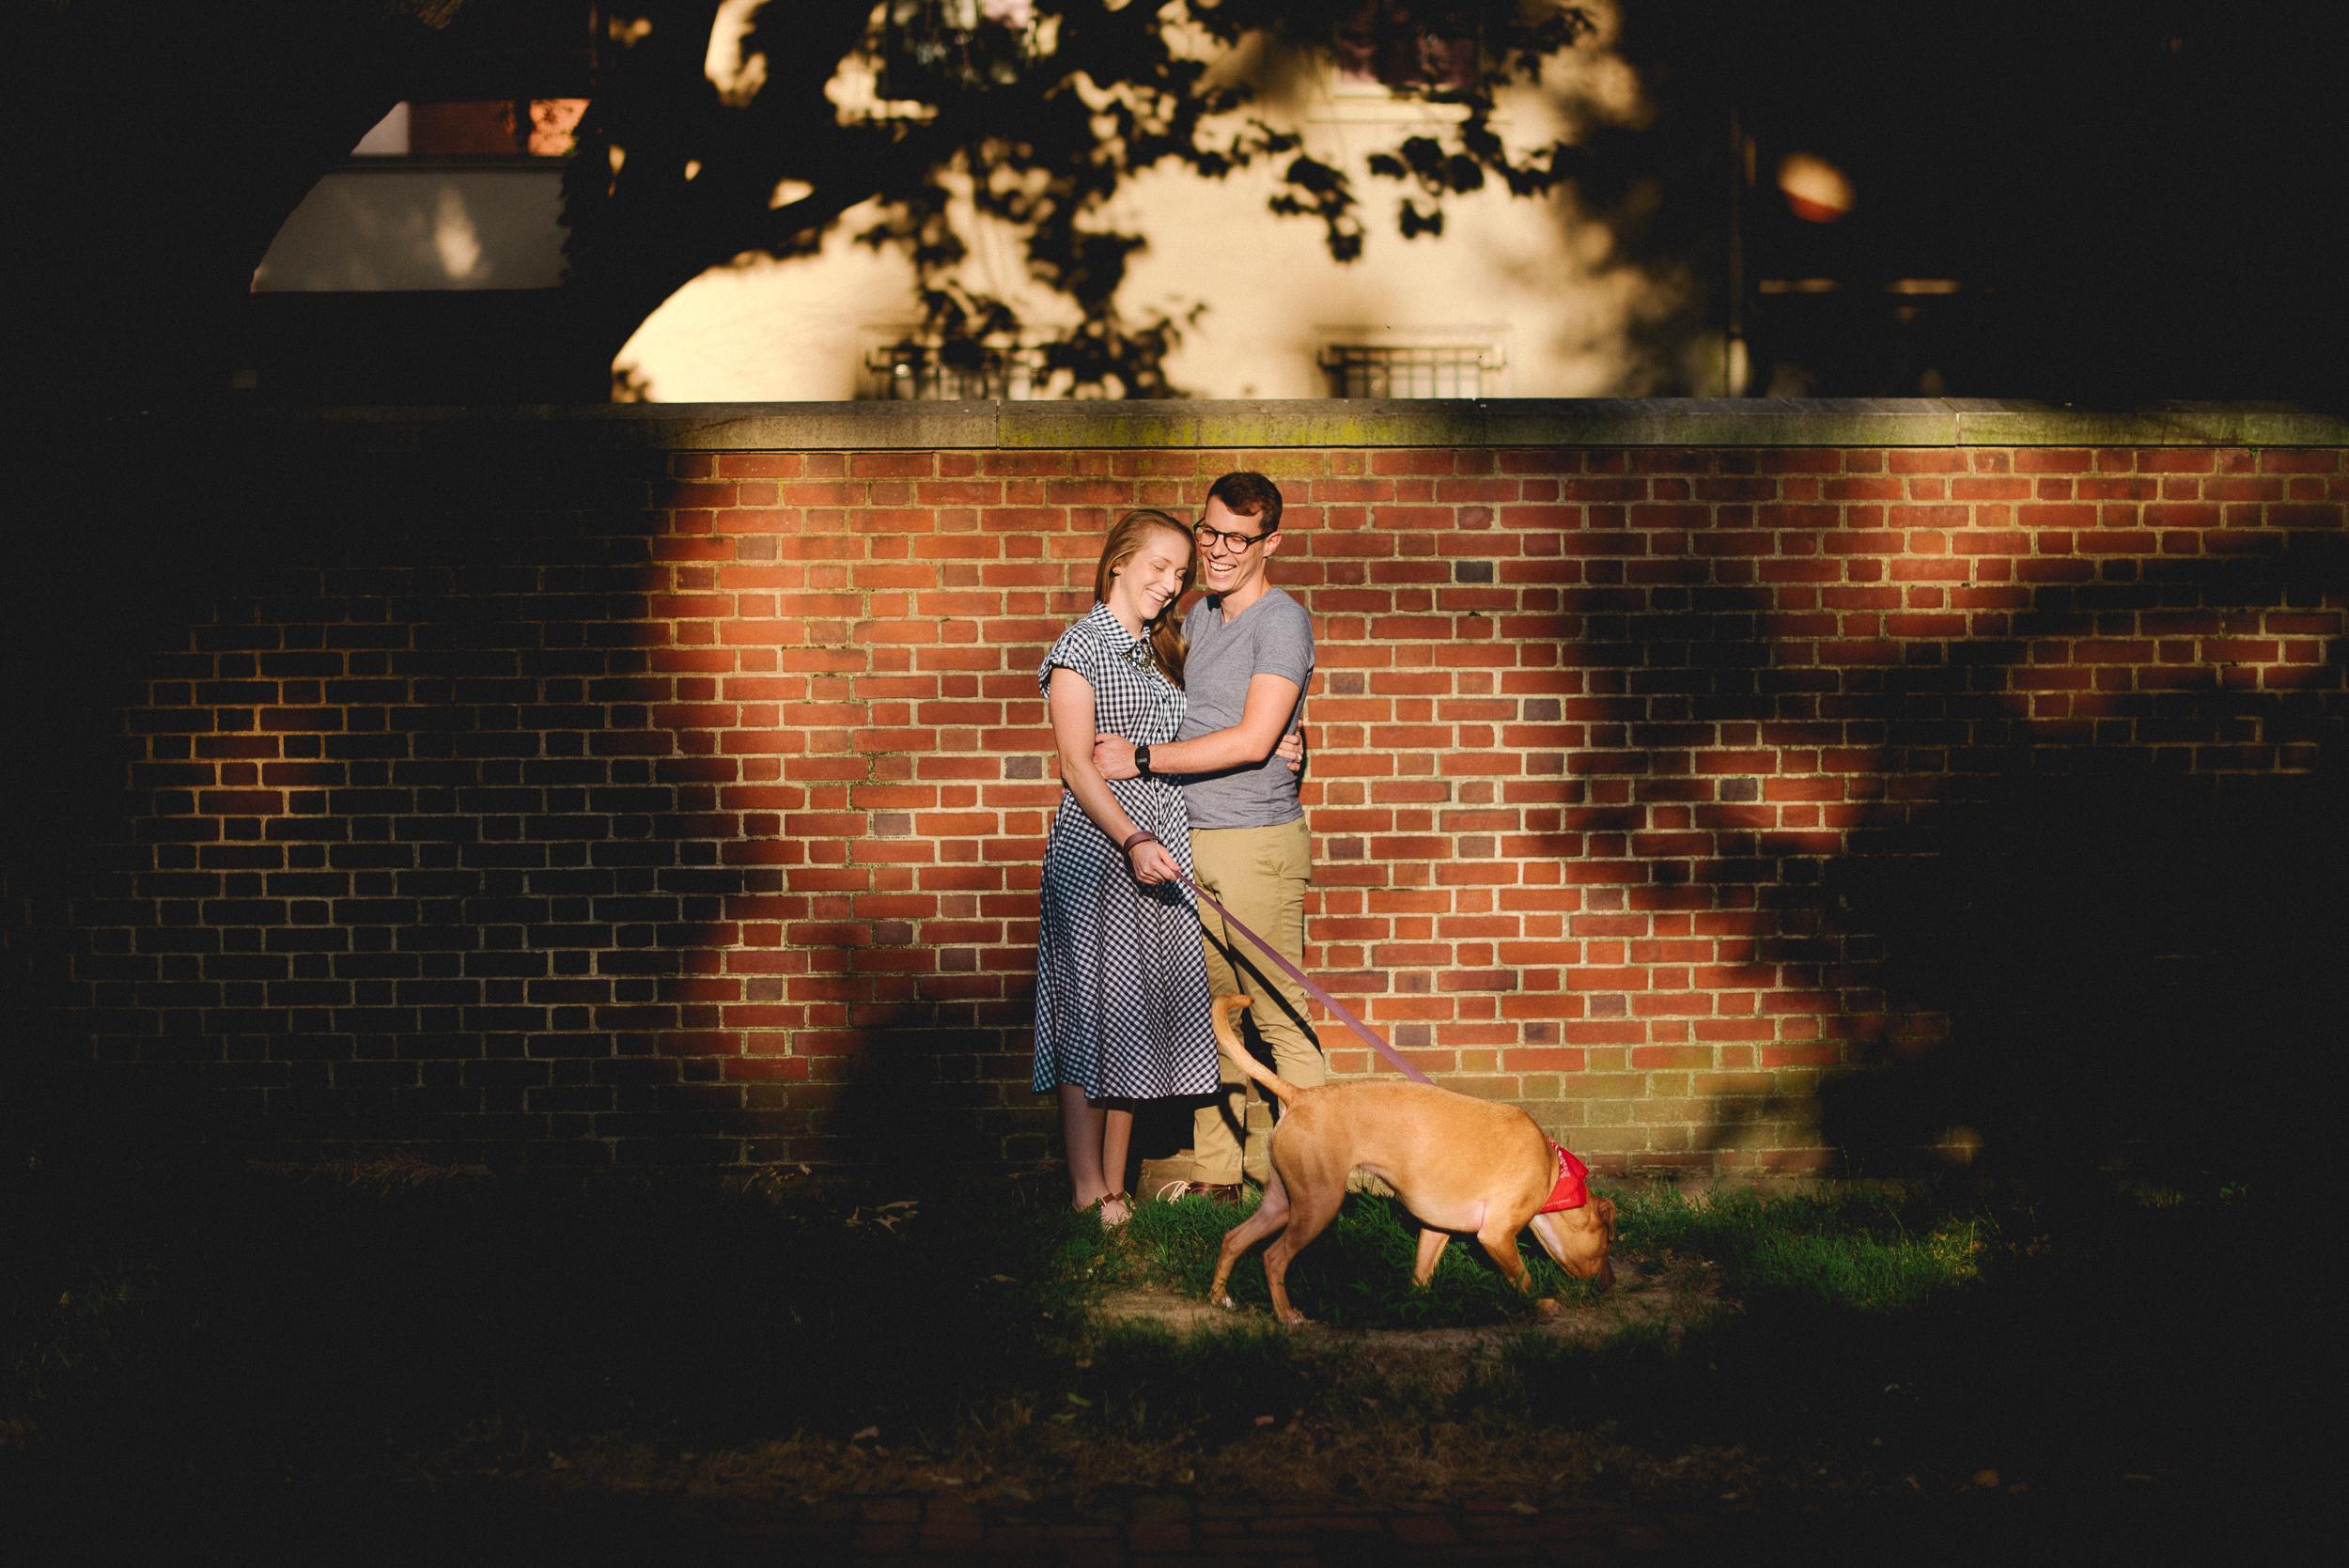 Peaberry-Photography-Society-Hill-Philadelphia-Pennsylvania-Newlyweds-Just-Married-013.jpg